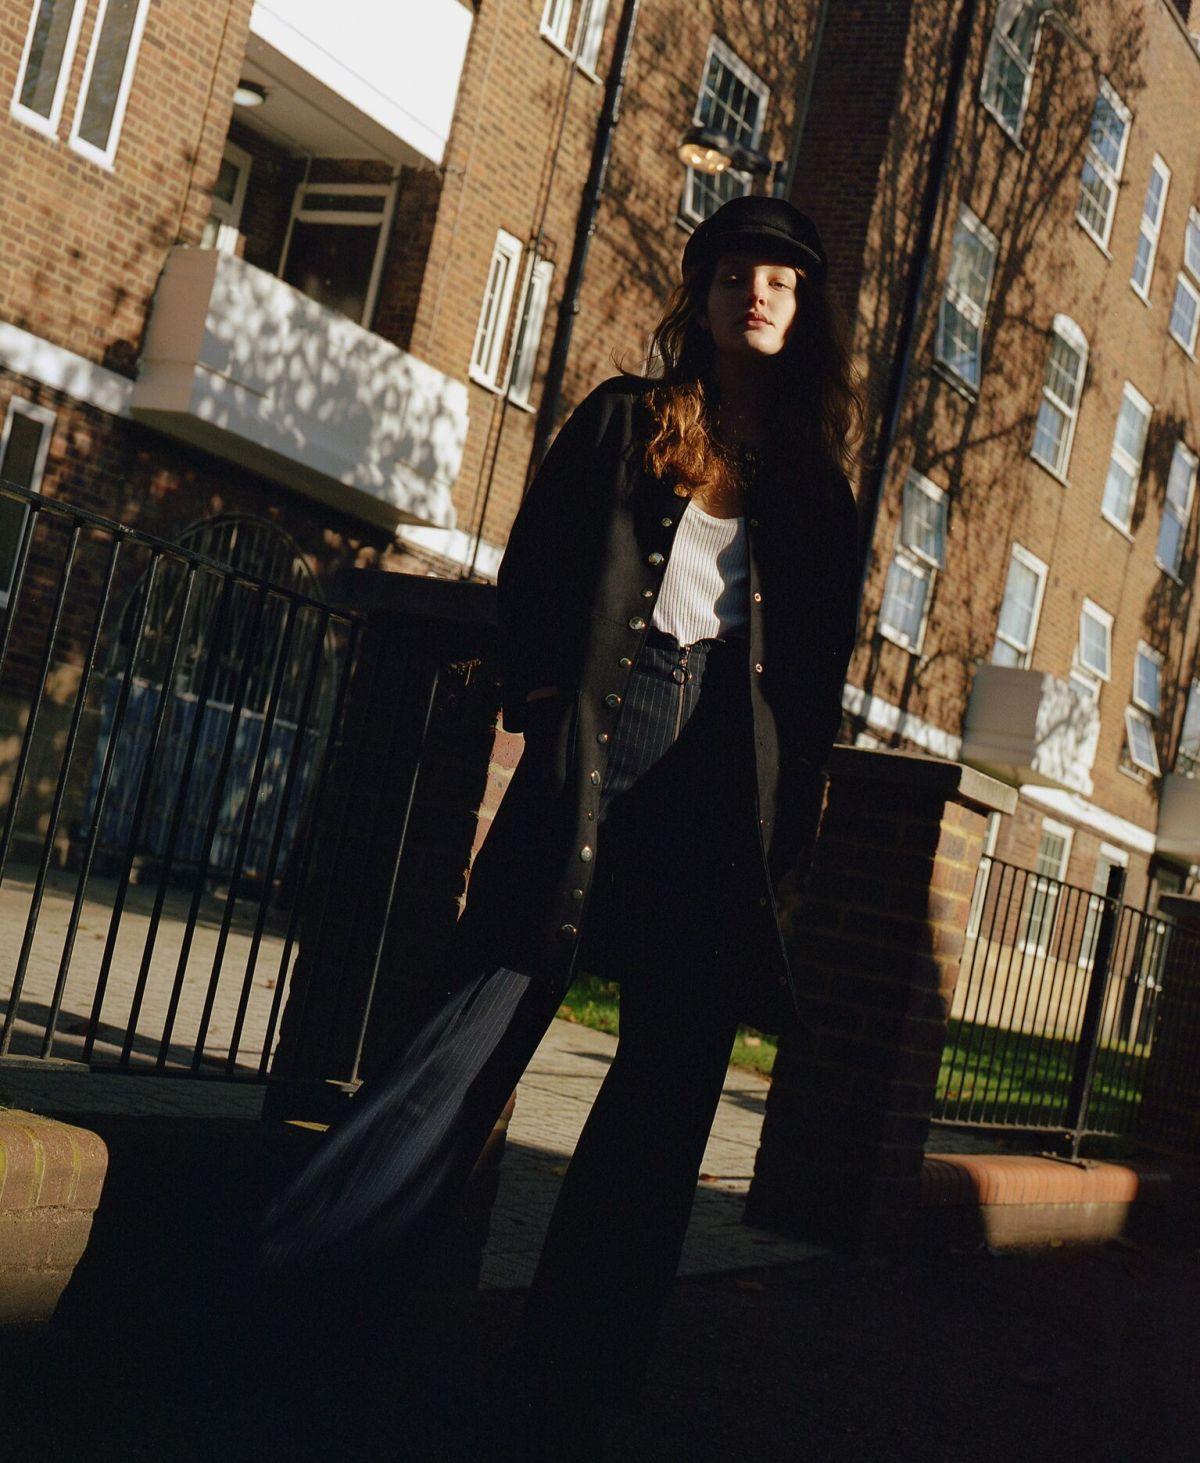 Natalia Renken by Mike Chalmers